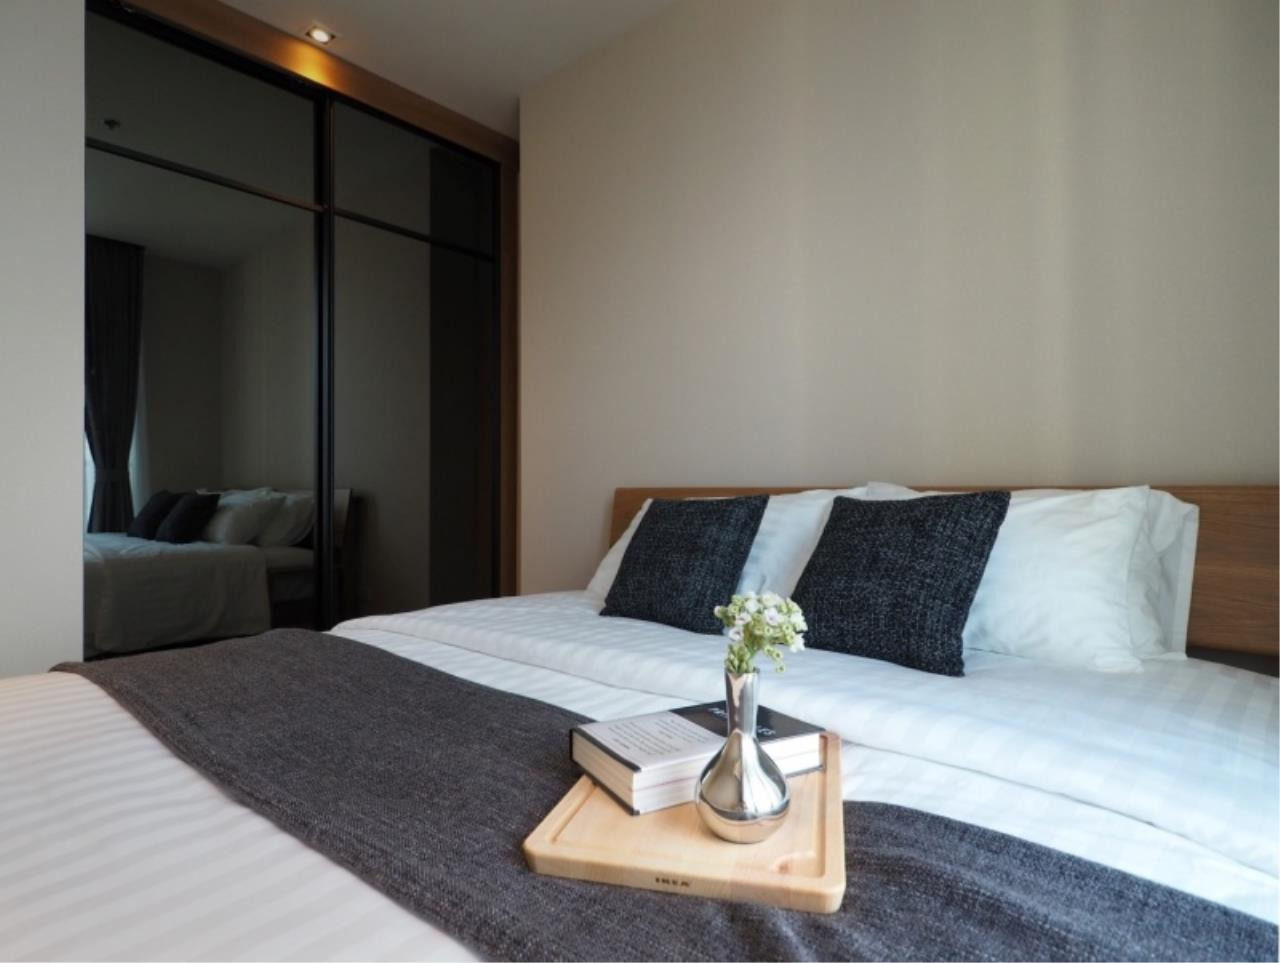 Century21 Skylux Agency's Park 24 / Condo For Rent / 2 Bedroom / 53.53 SQM / BTS Phrom Phong / Bangkok 10